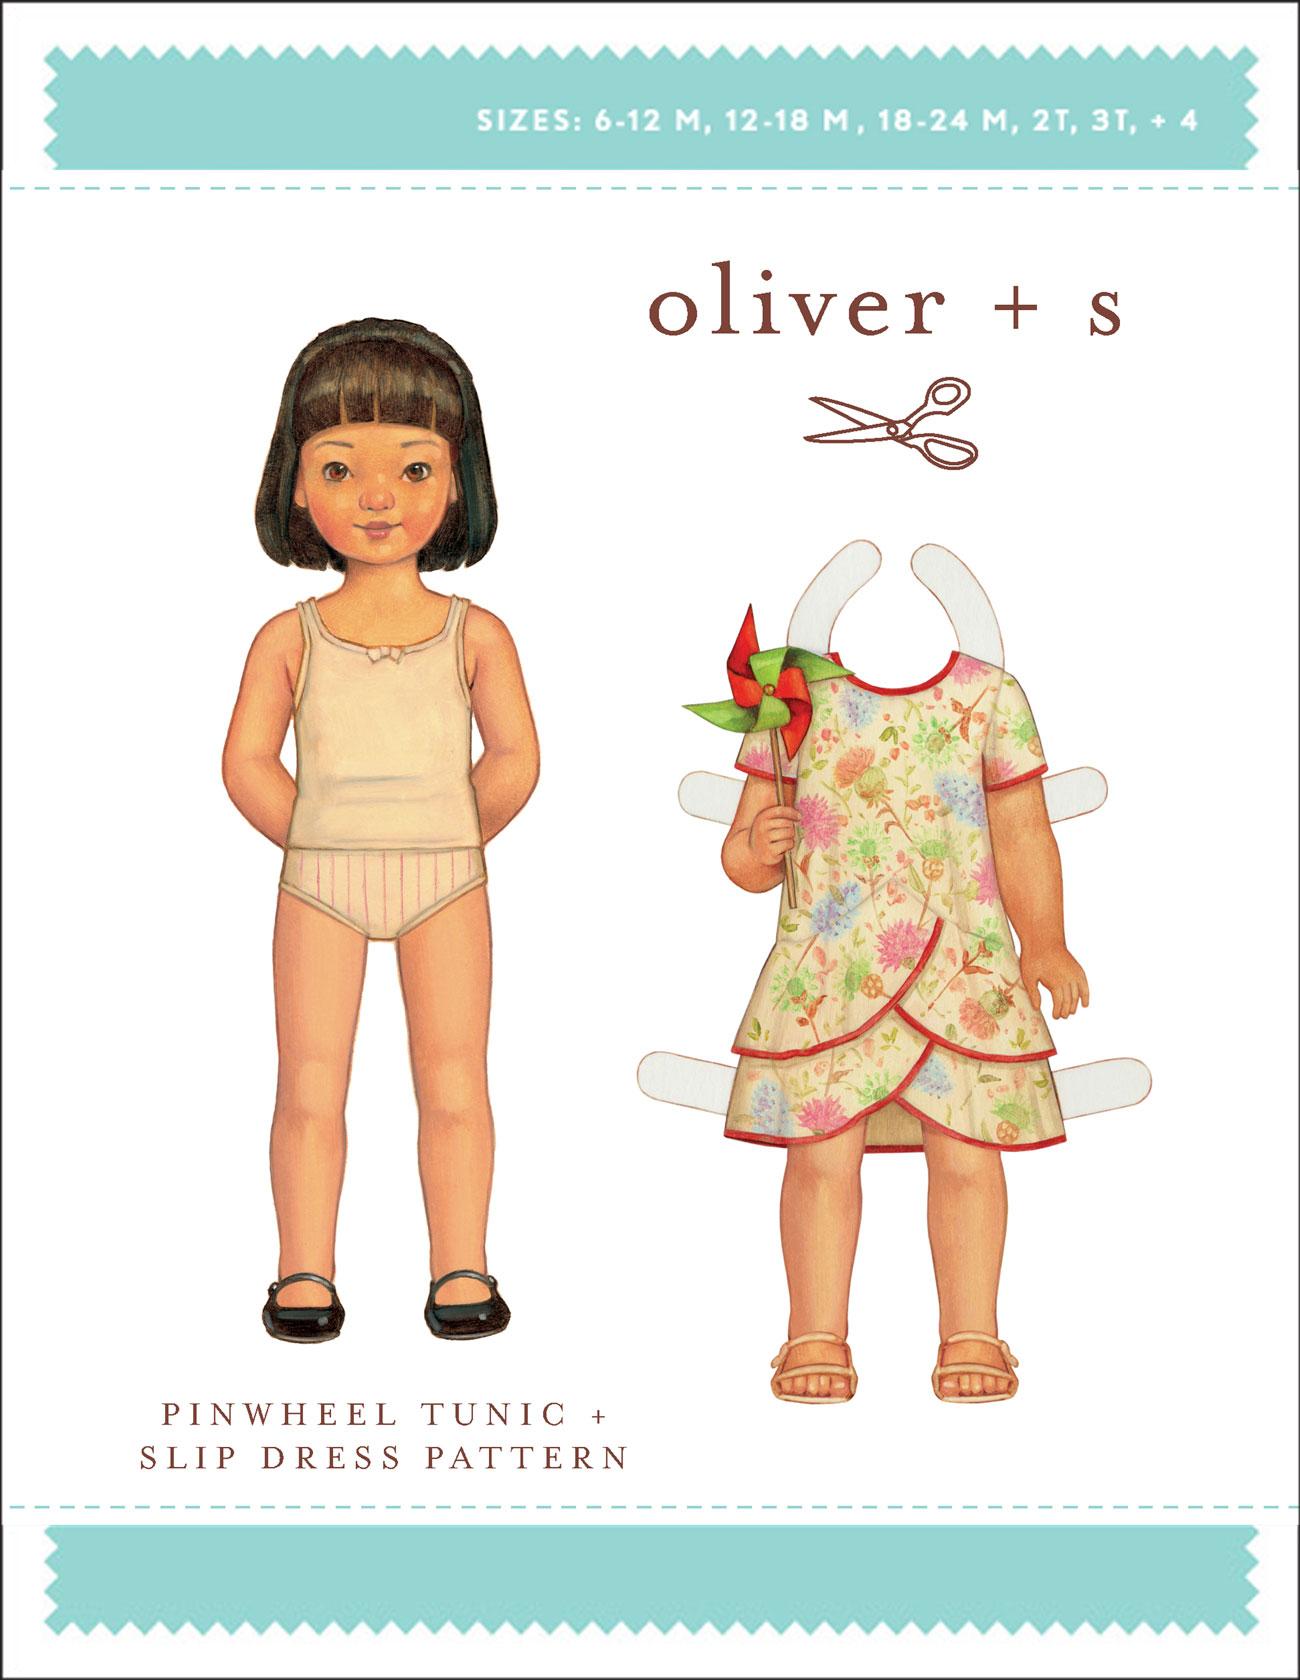 Pinwheel Tunic & Slip Dress - Oliver + S